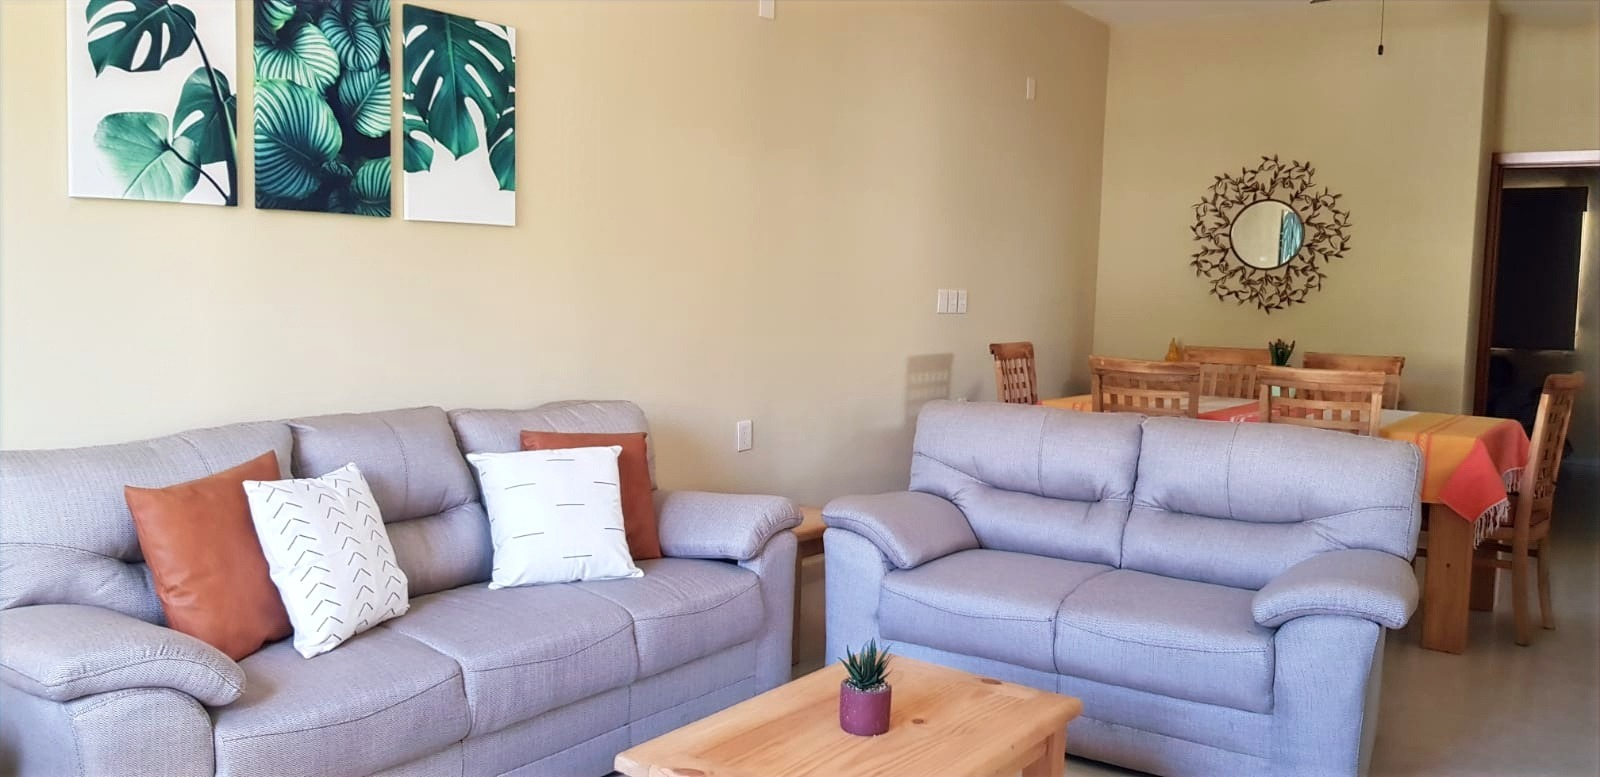 Brand new, comfortable furniture.